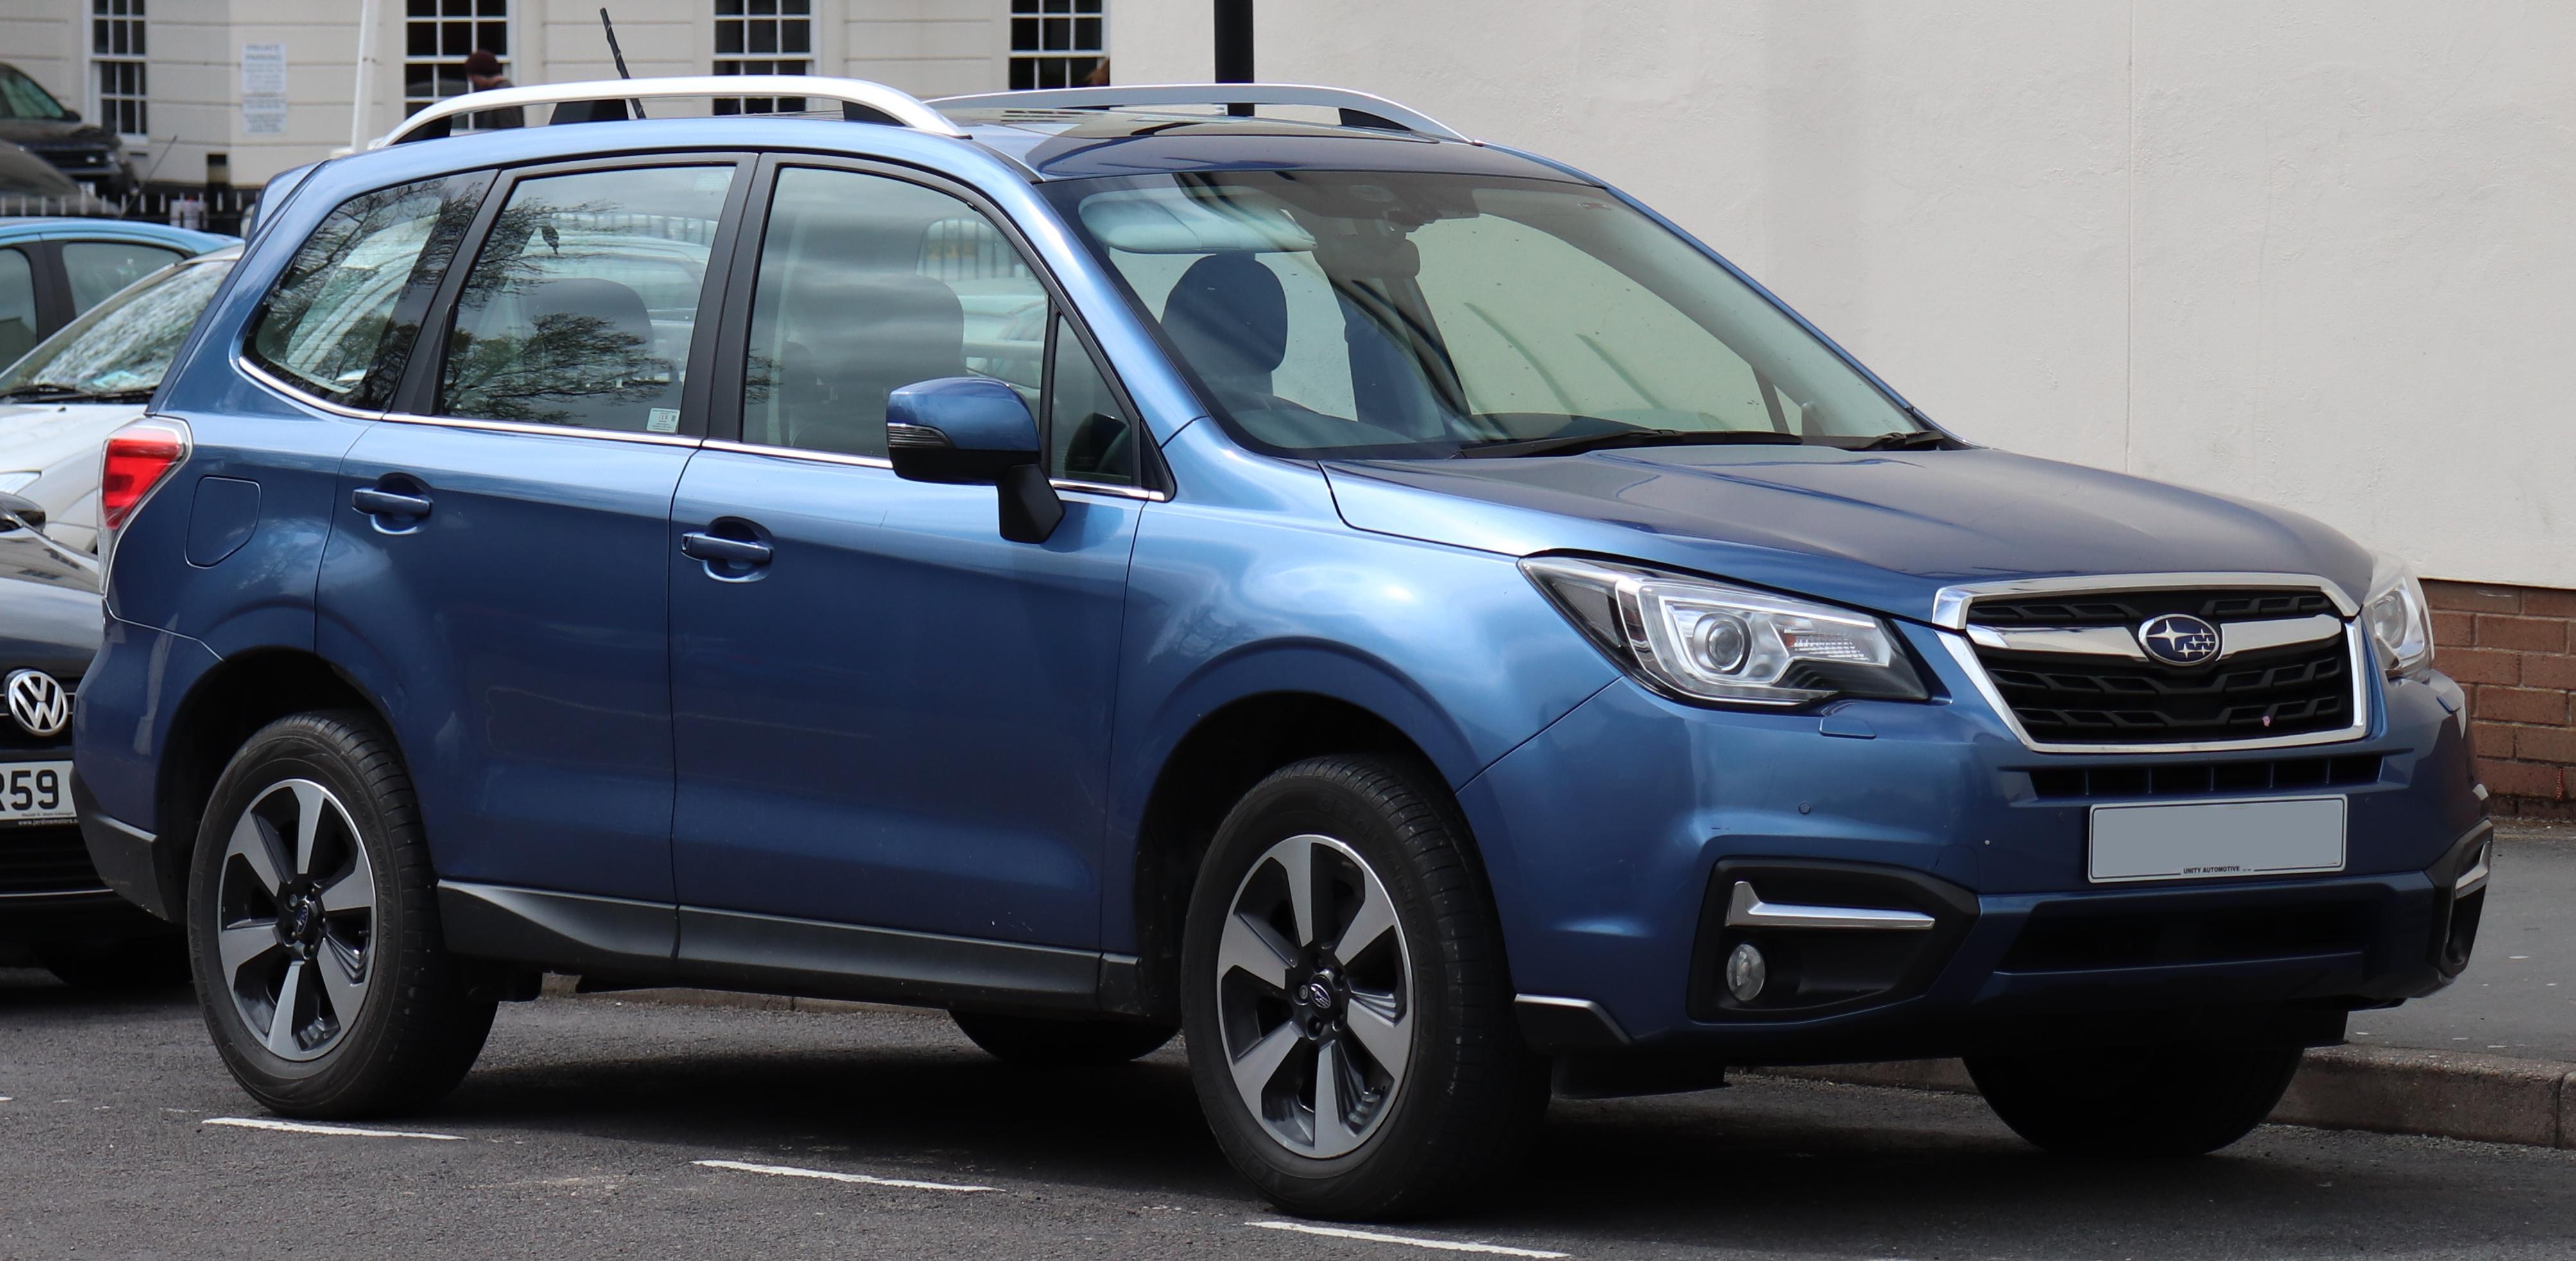 Blue Subaru Forester